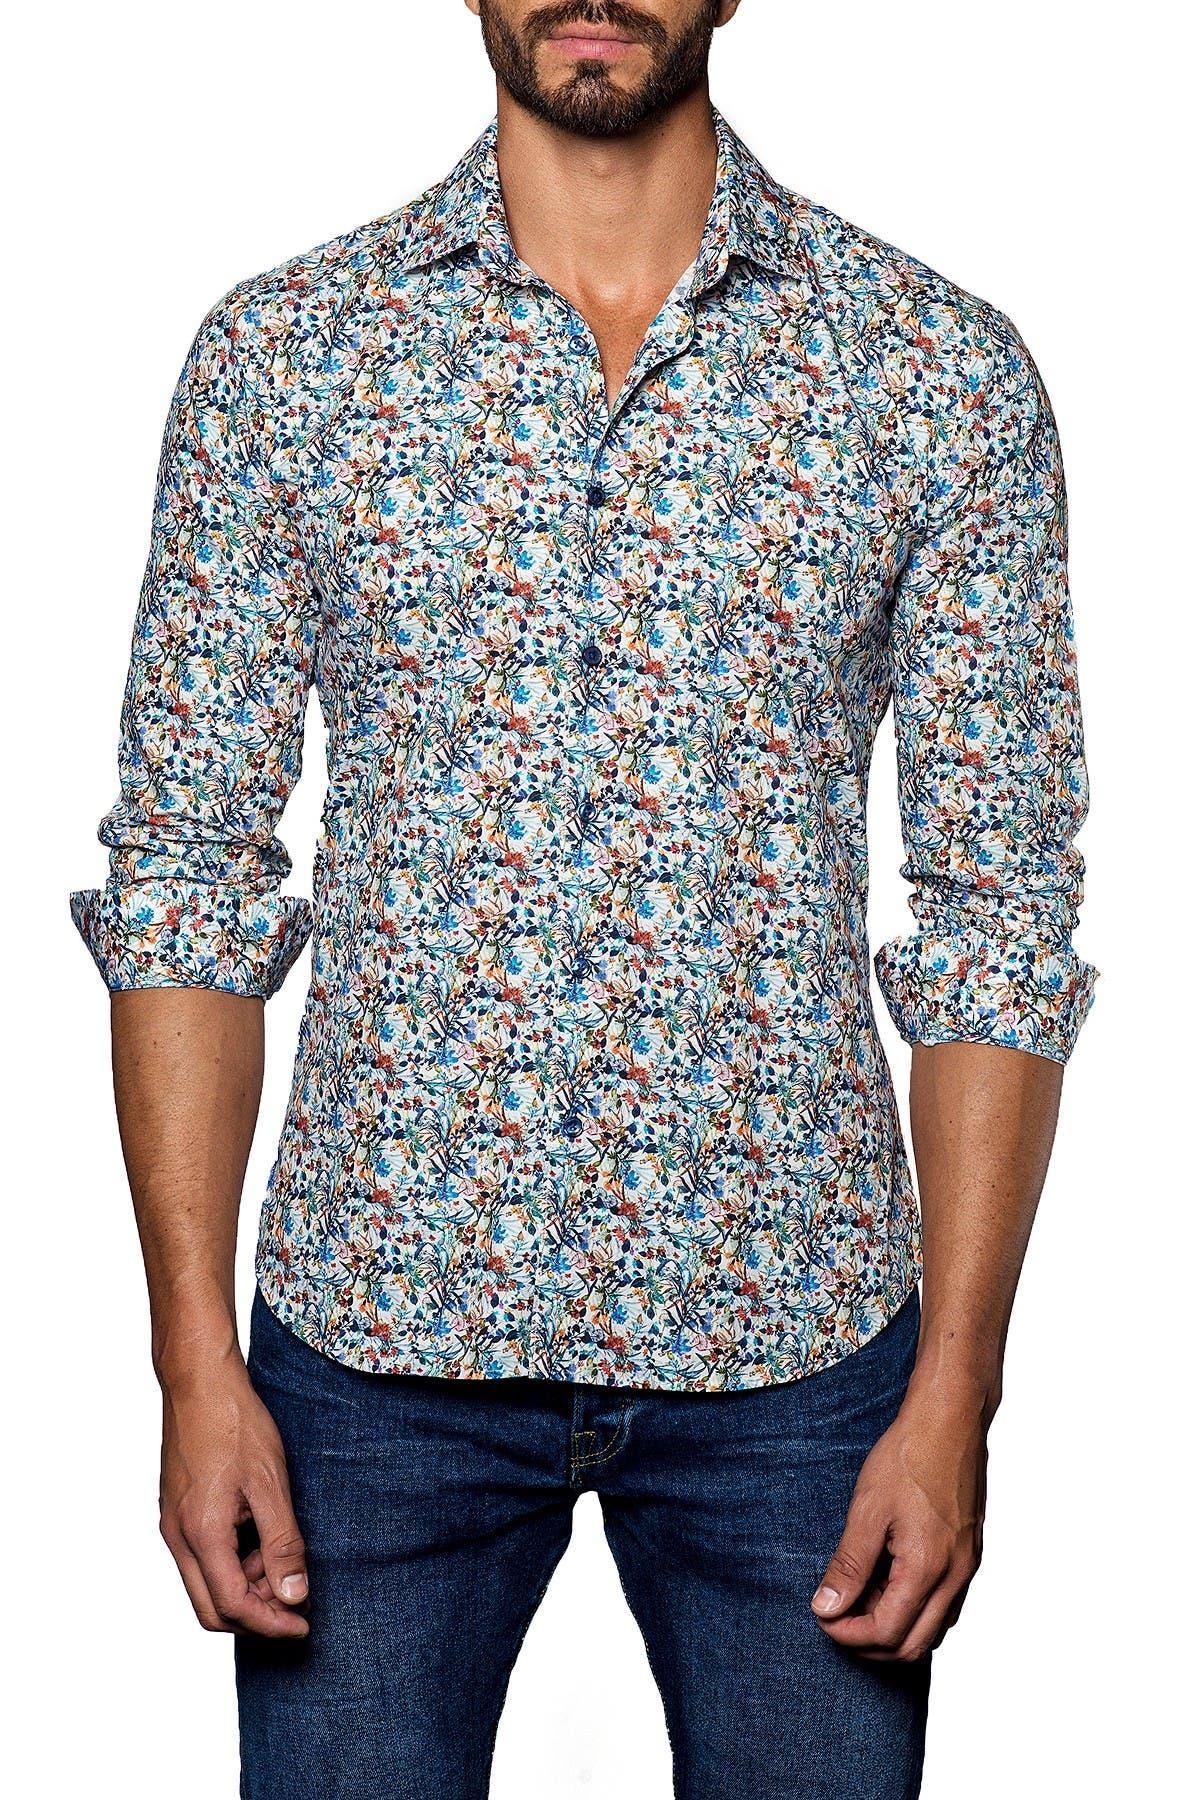 Image of Jared Lang Printed Trim Fit Long Sleeve Shirt